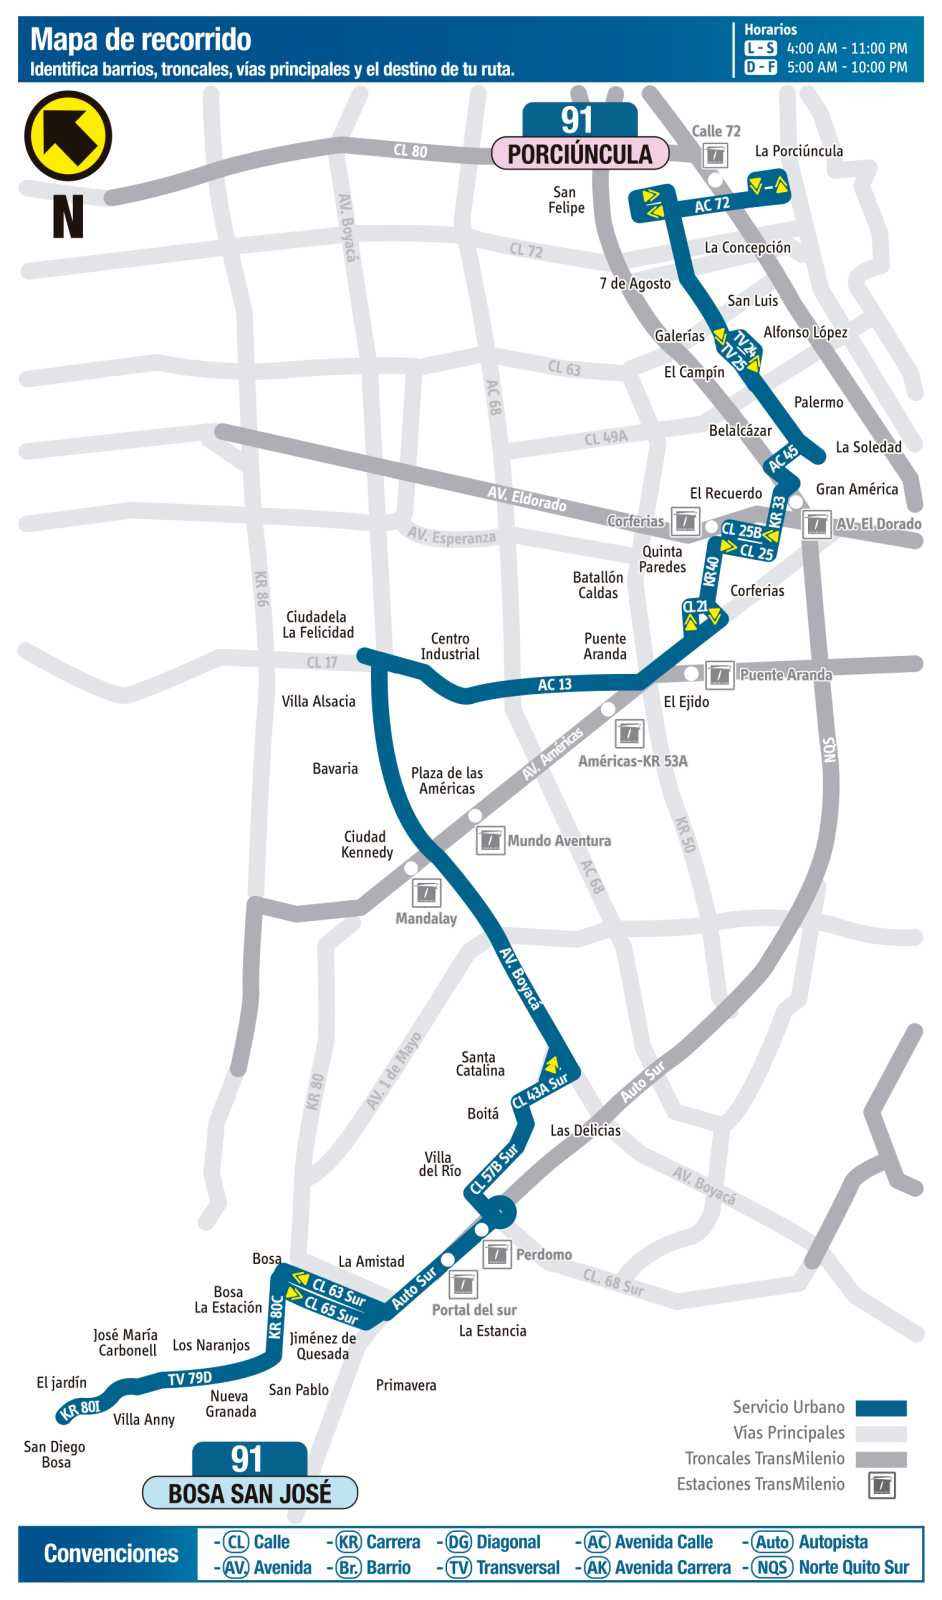 Ruta SITP: 91 Bosa, San José ↔ Porciúncula (mapa)